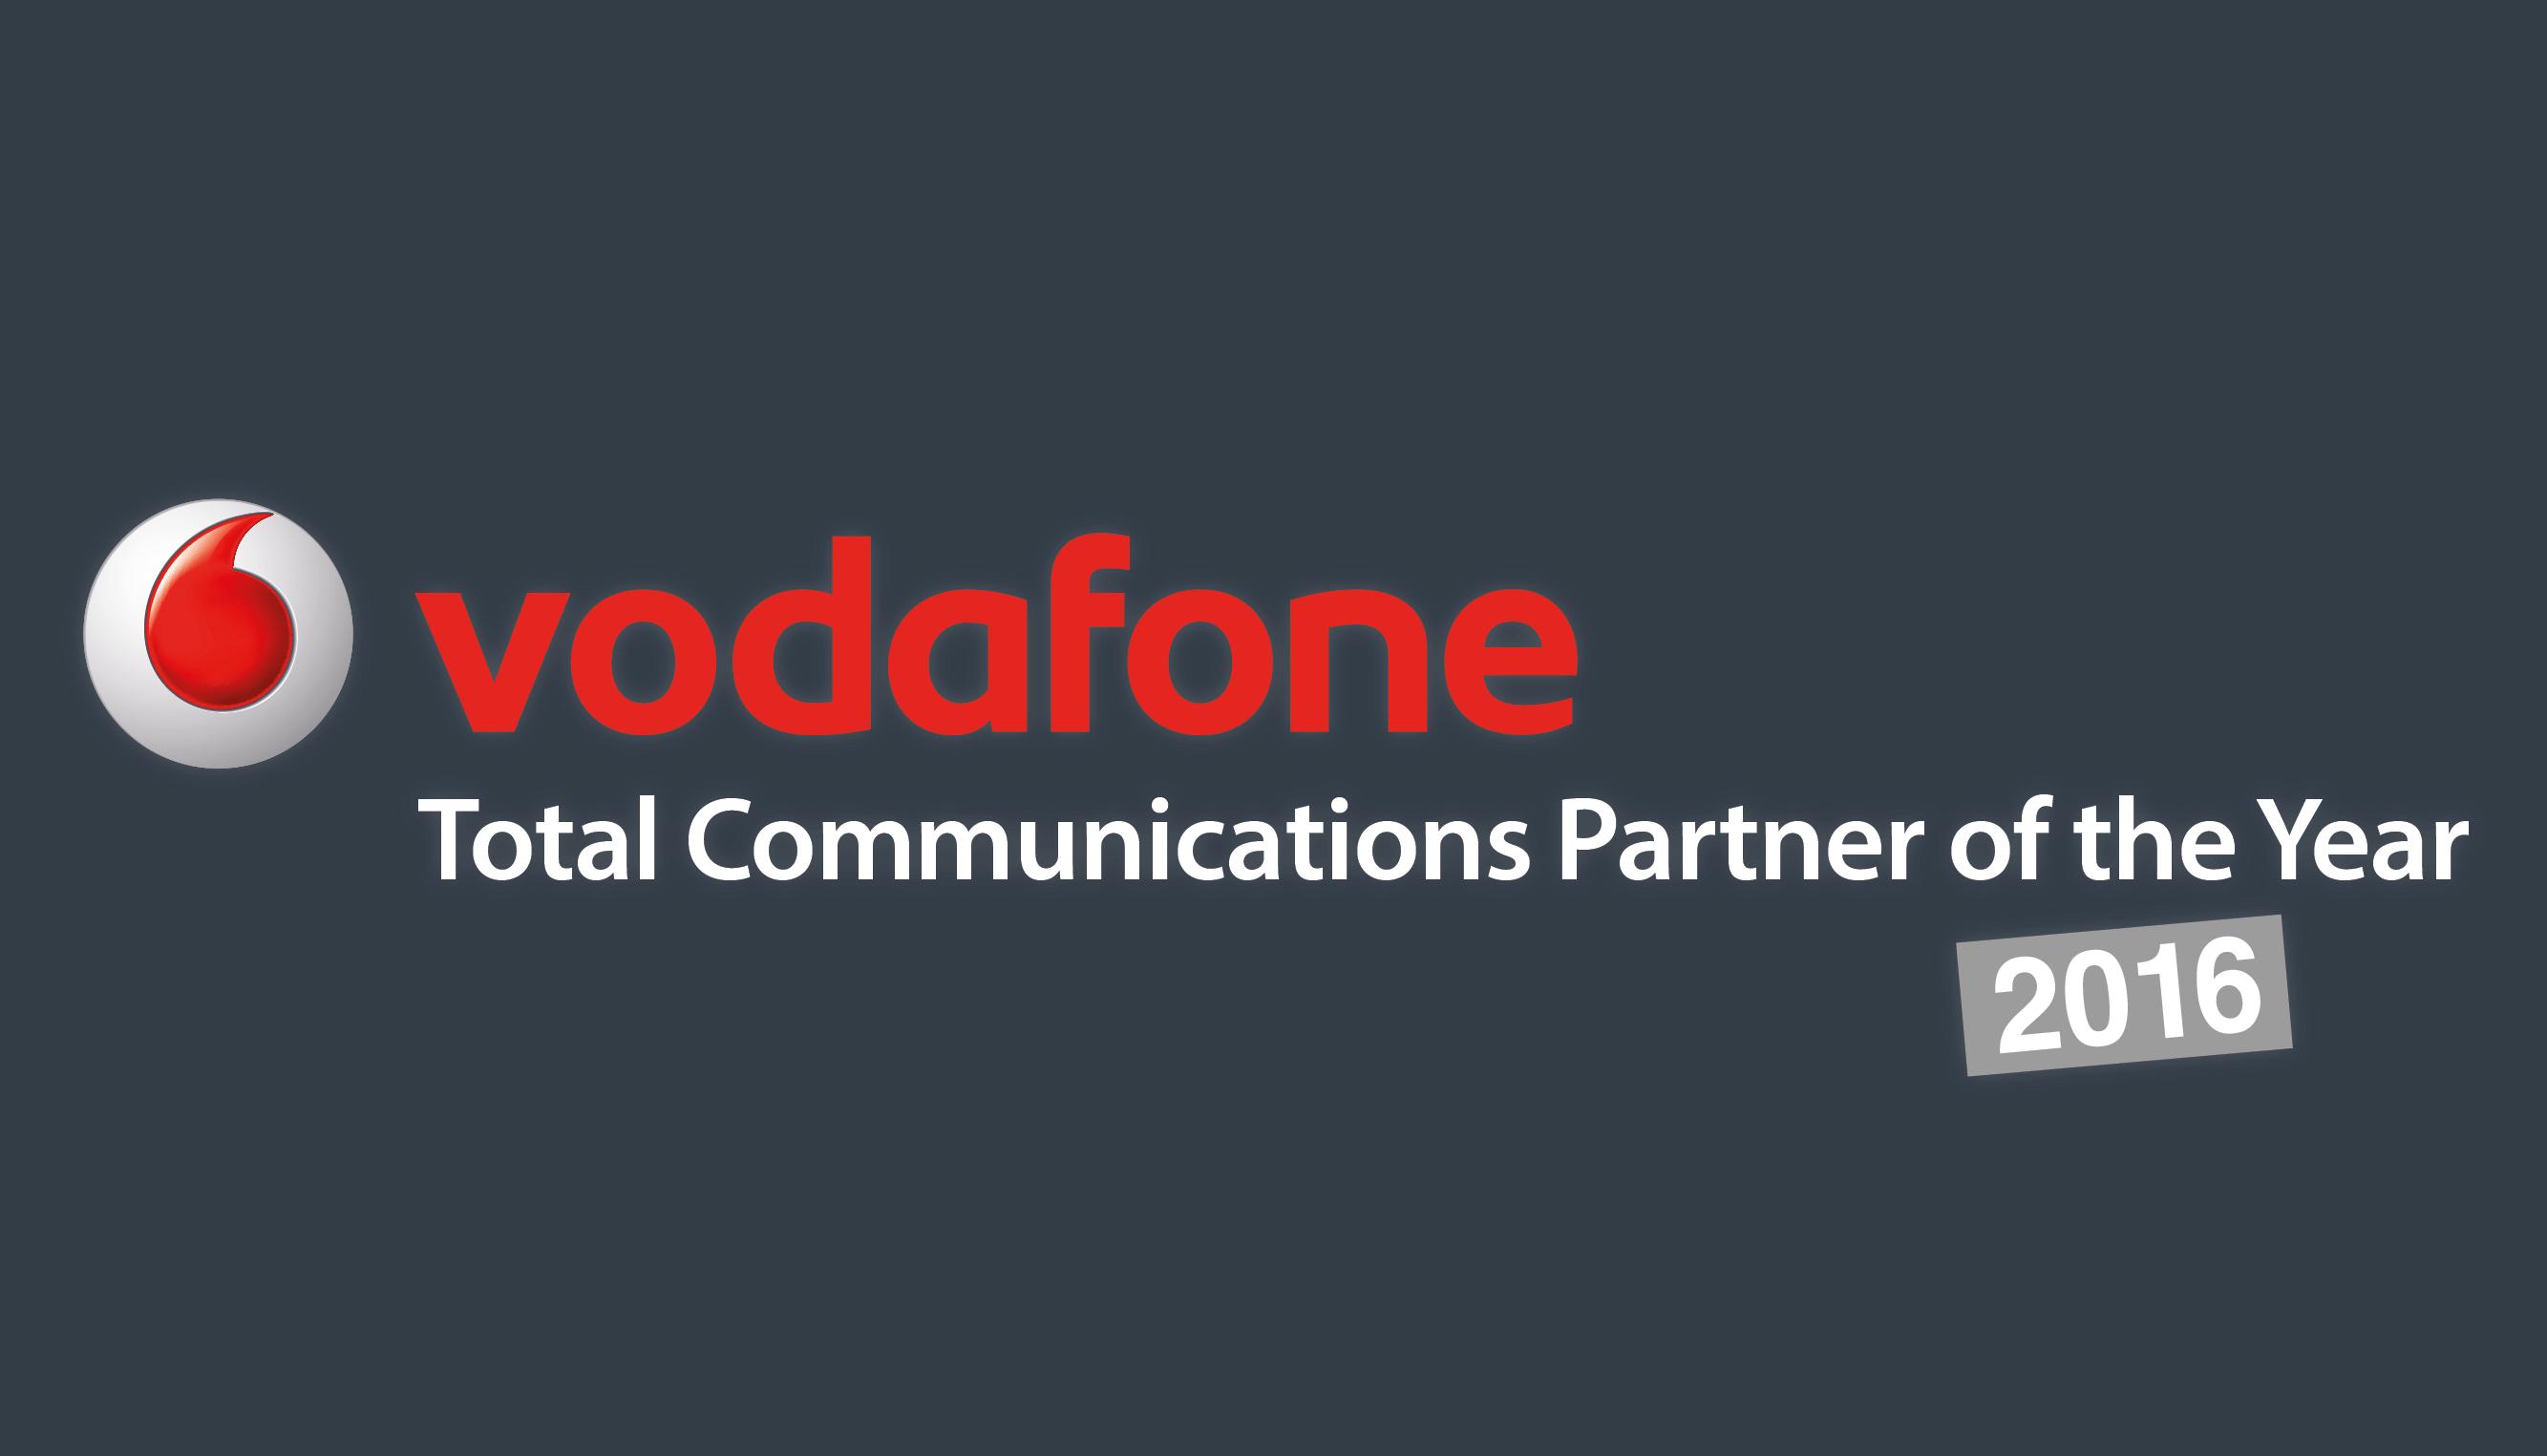 Onecom is Vodafone's Total Communications Partner 2016